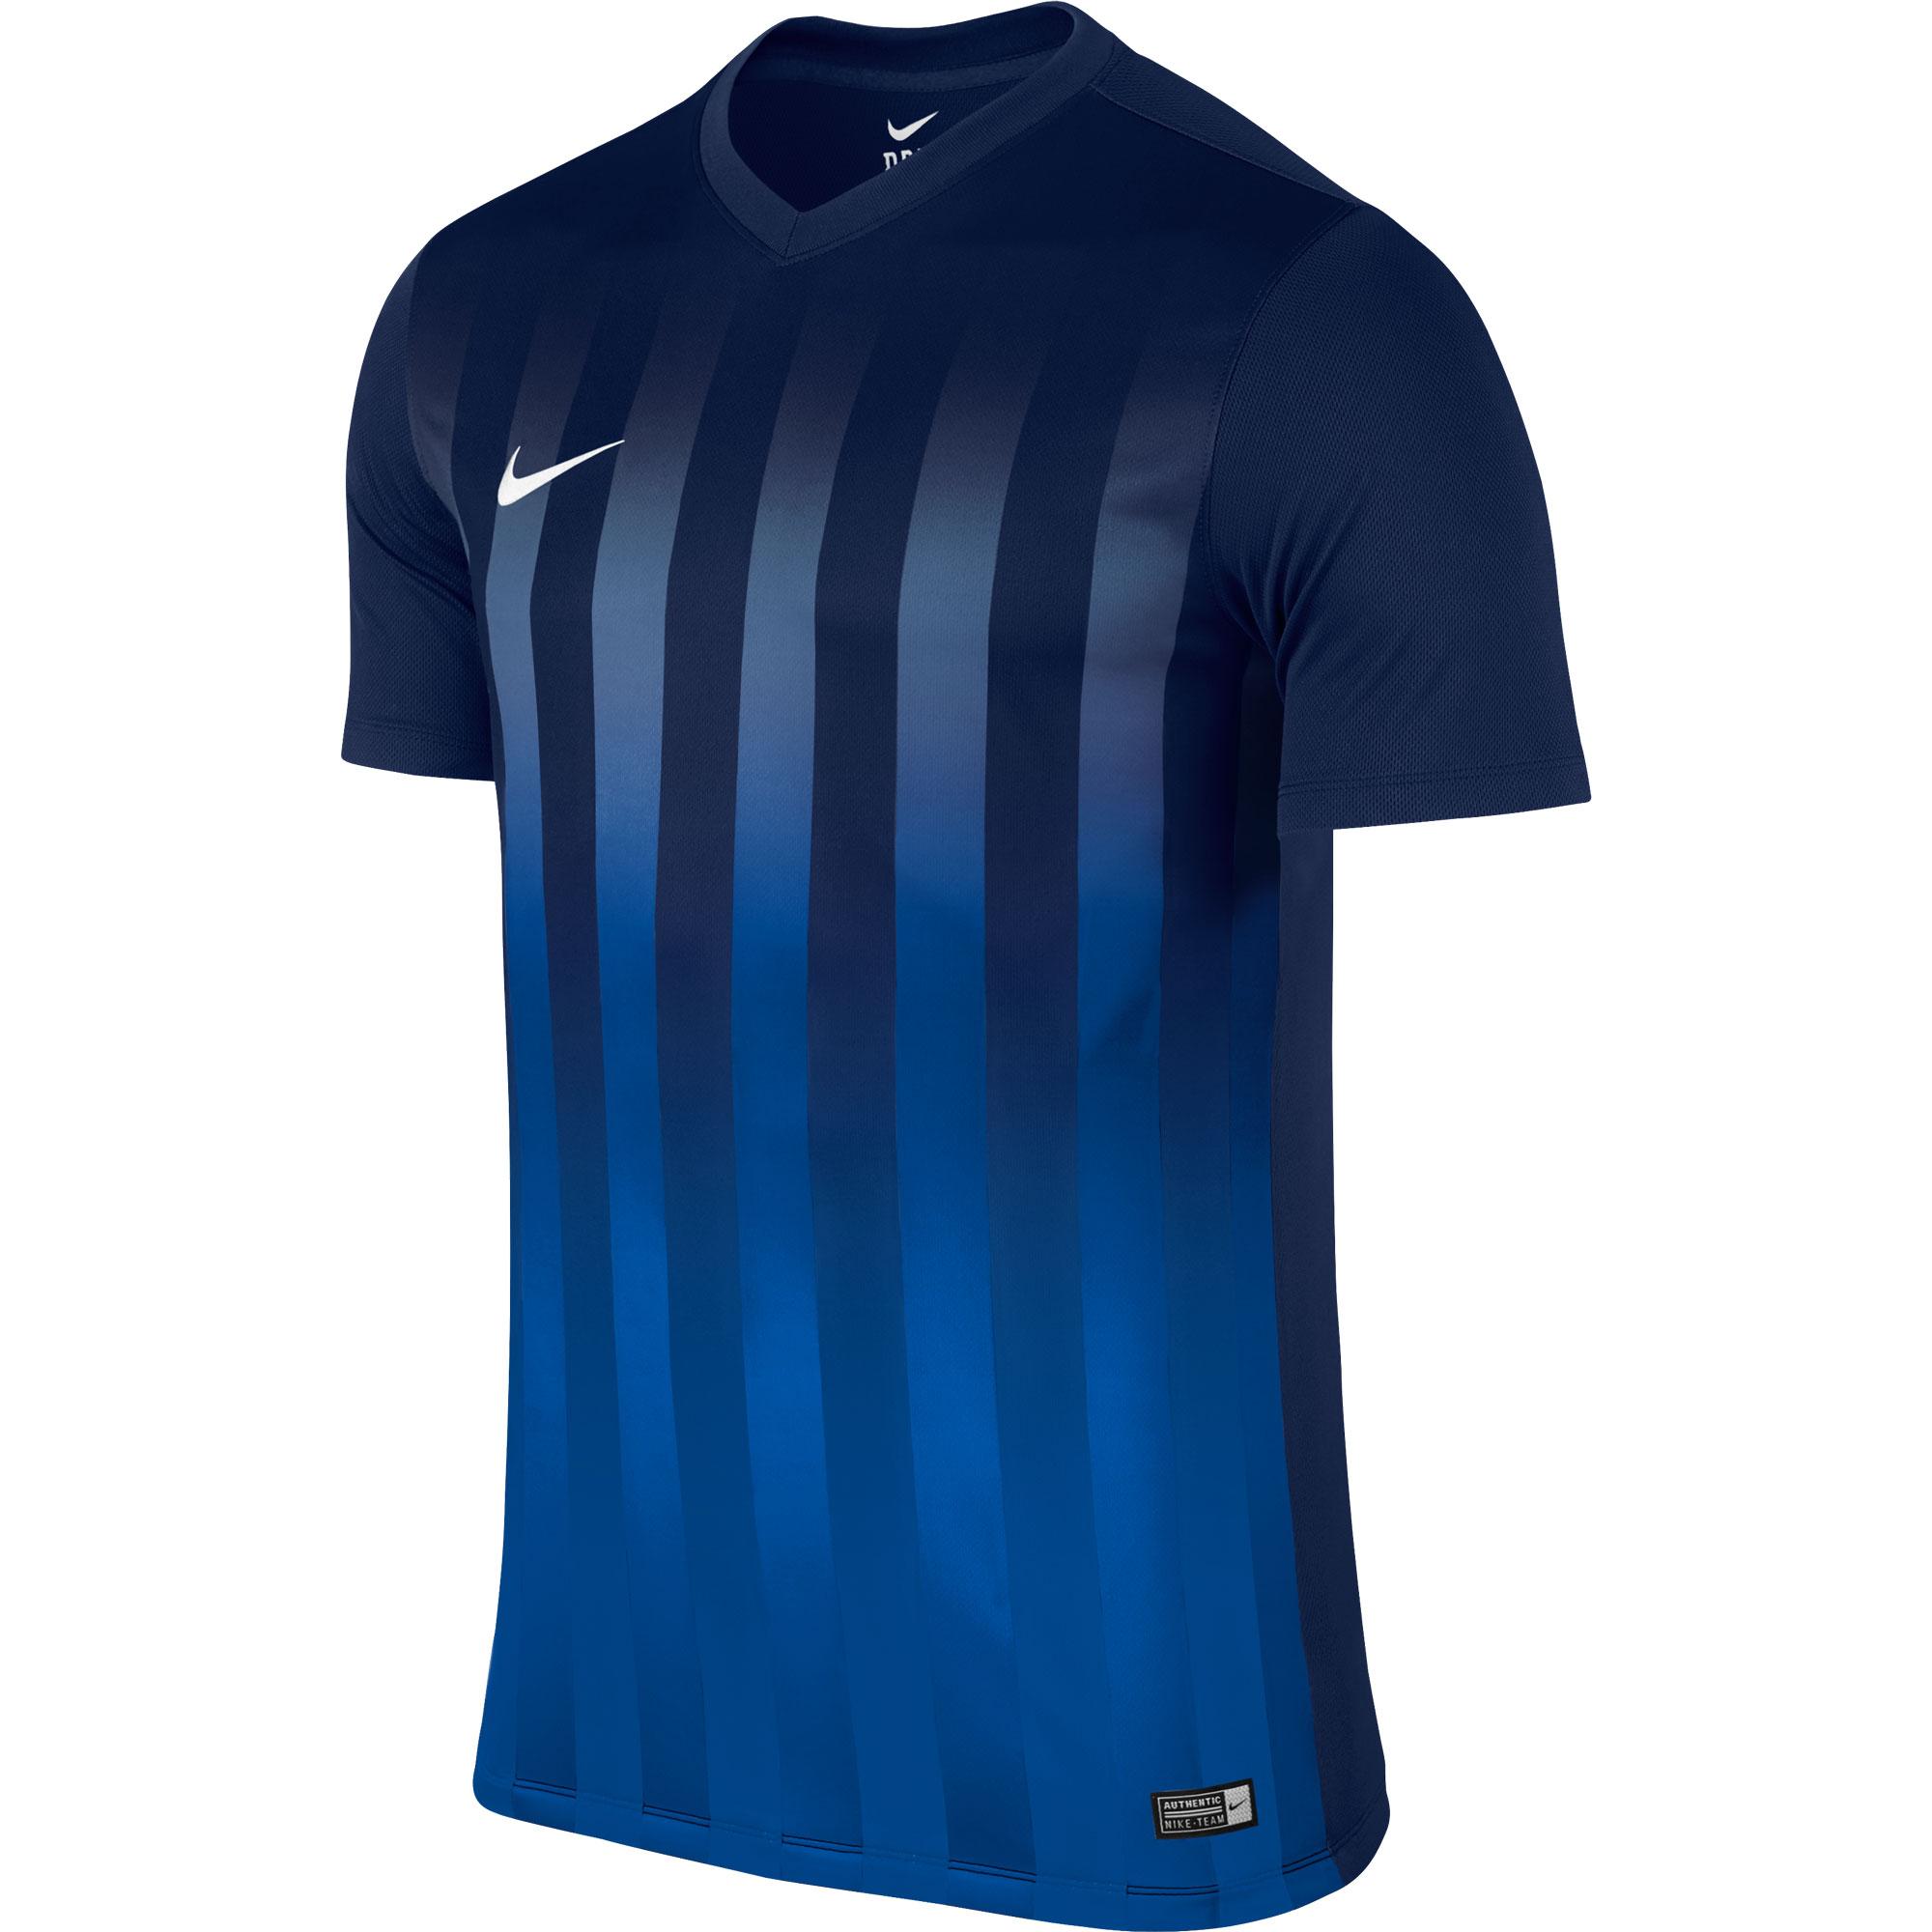 Nike Herren Trikot Striped Division II 725893-410 S